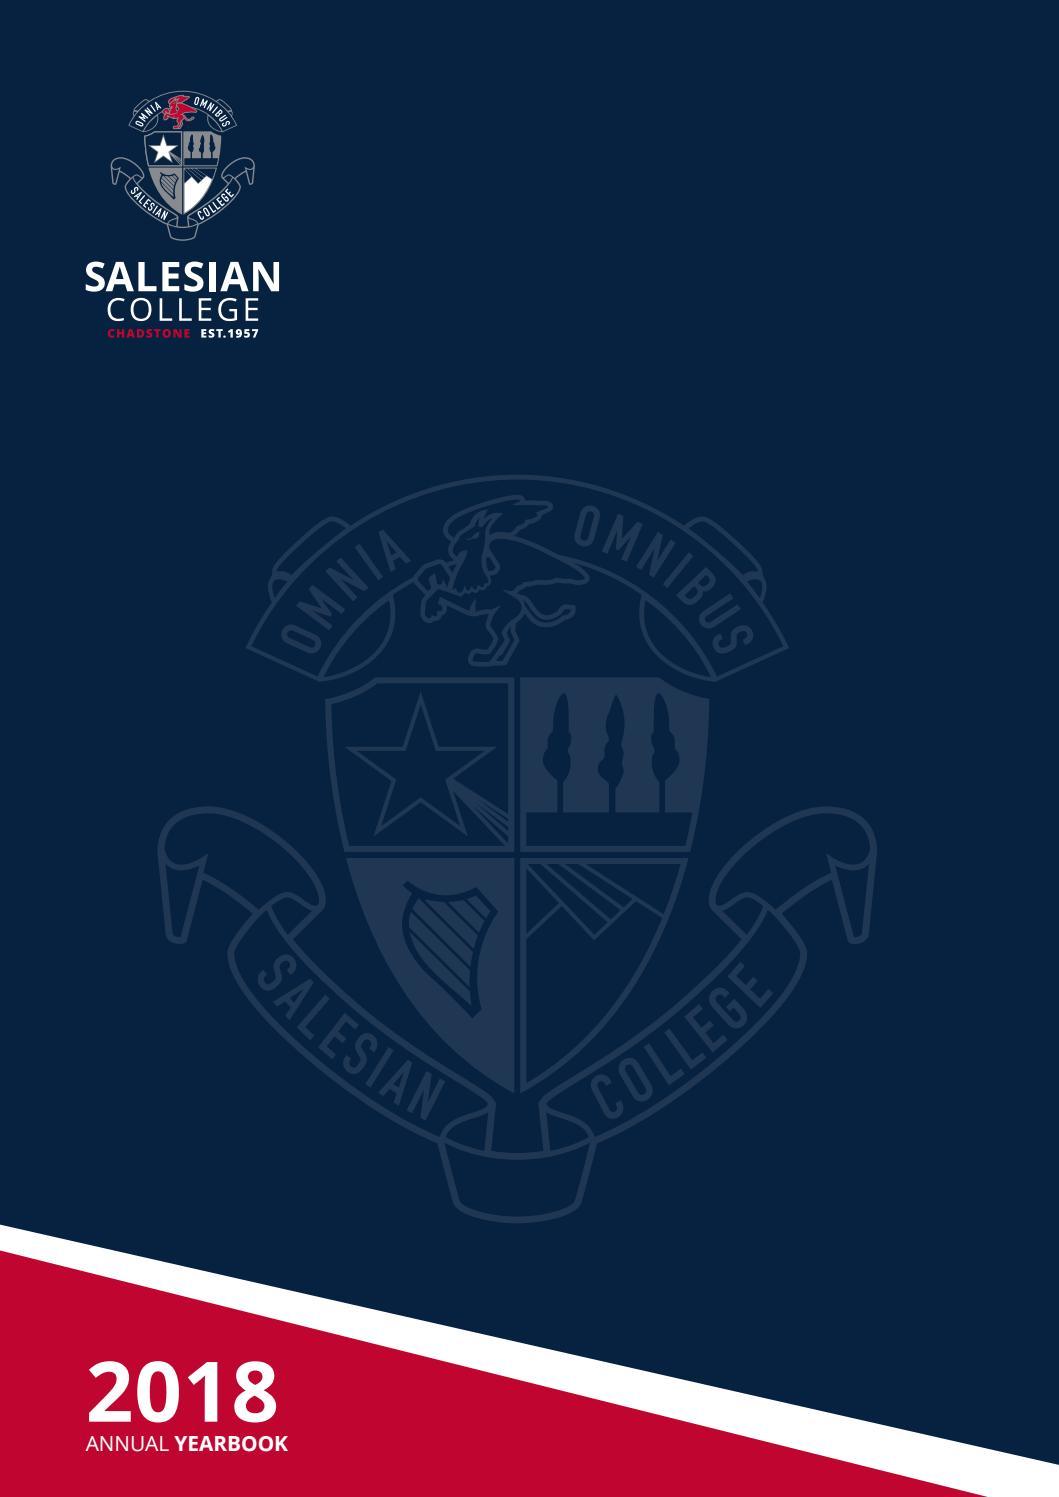 2018 Yearbook by SalesianCollegeChadstone - issuu